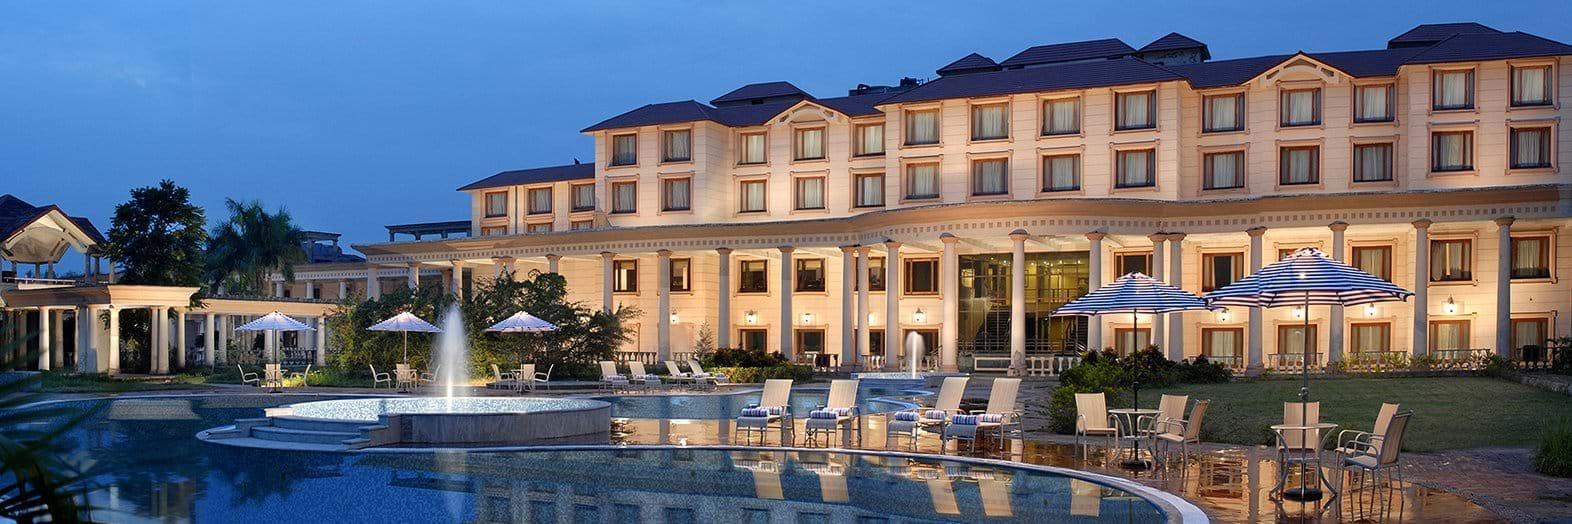 Hotels in  Kolkata - Fortune Park Panchwati